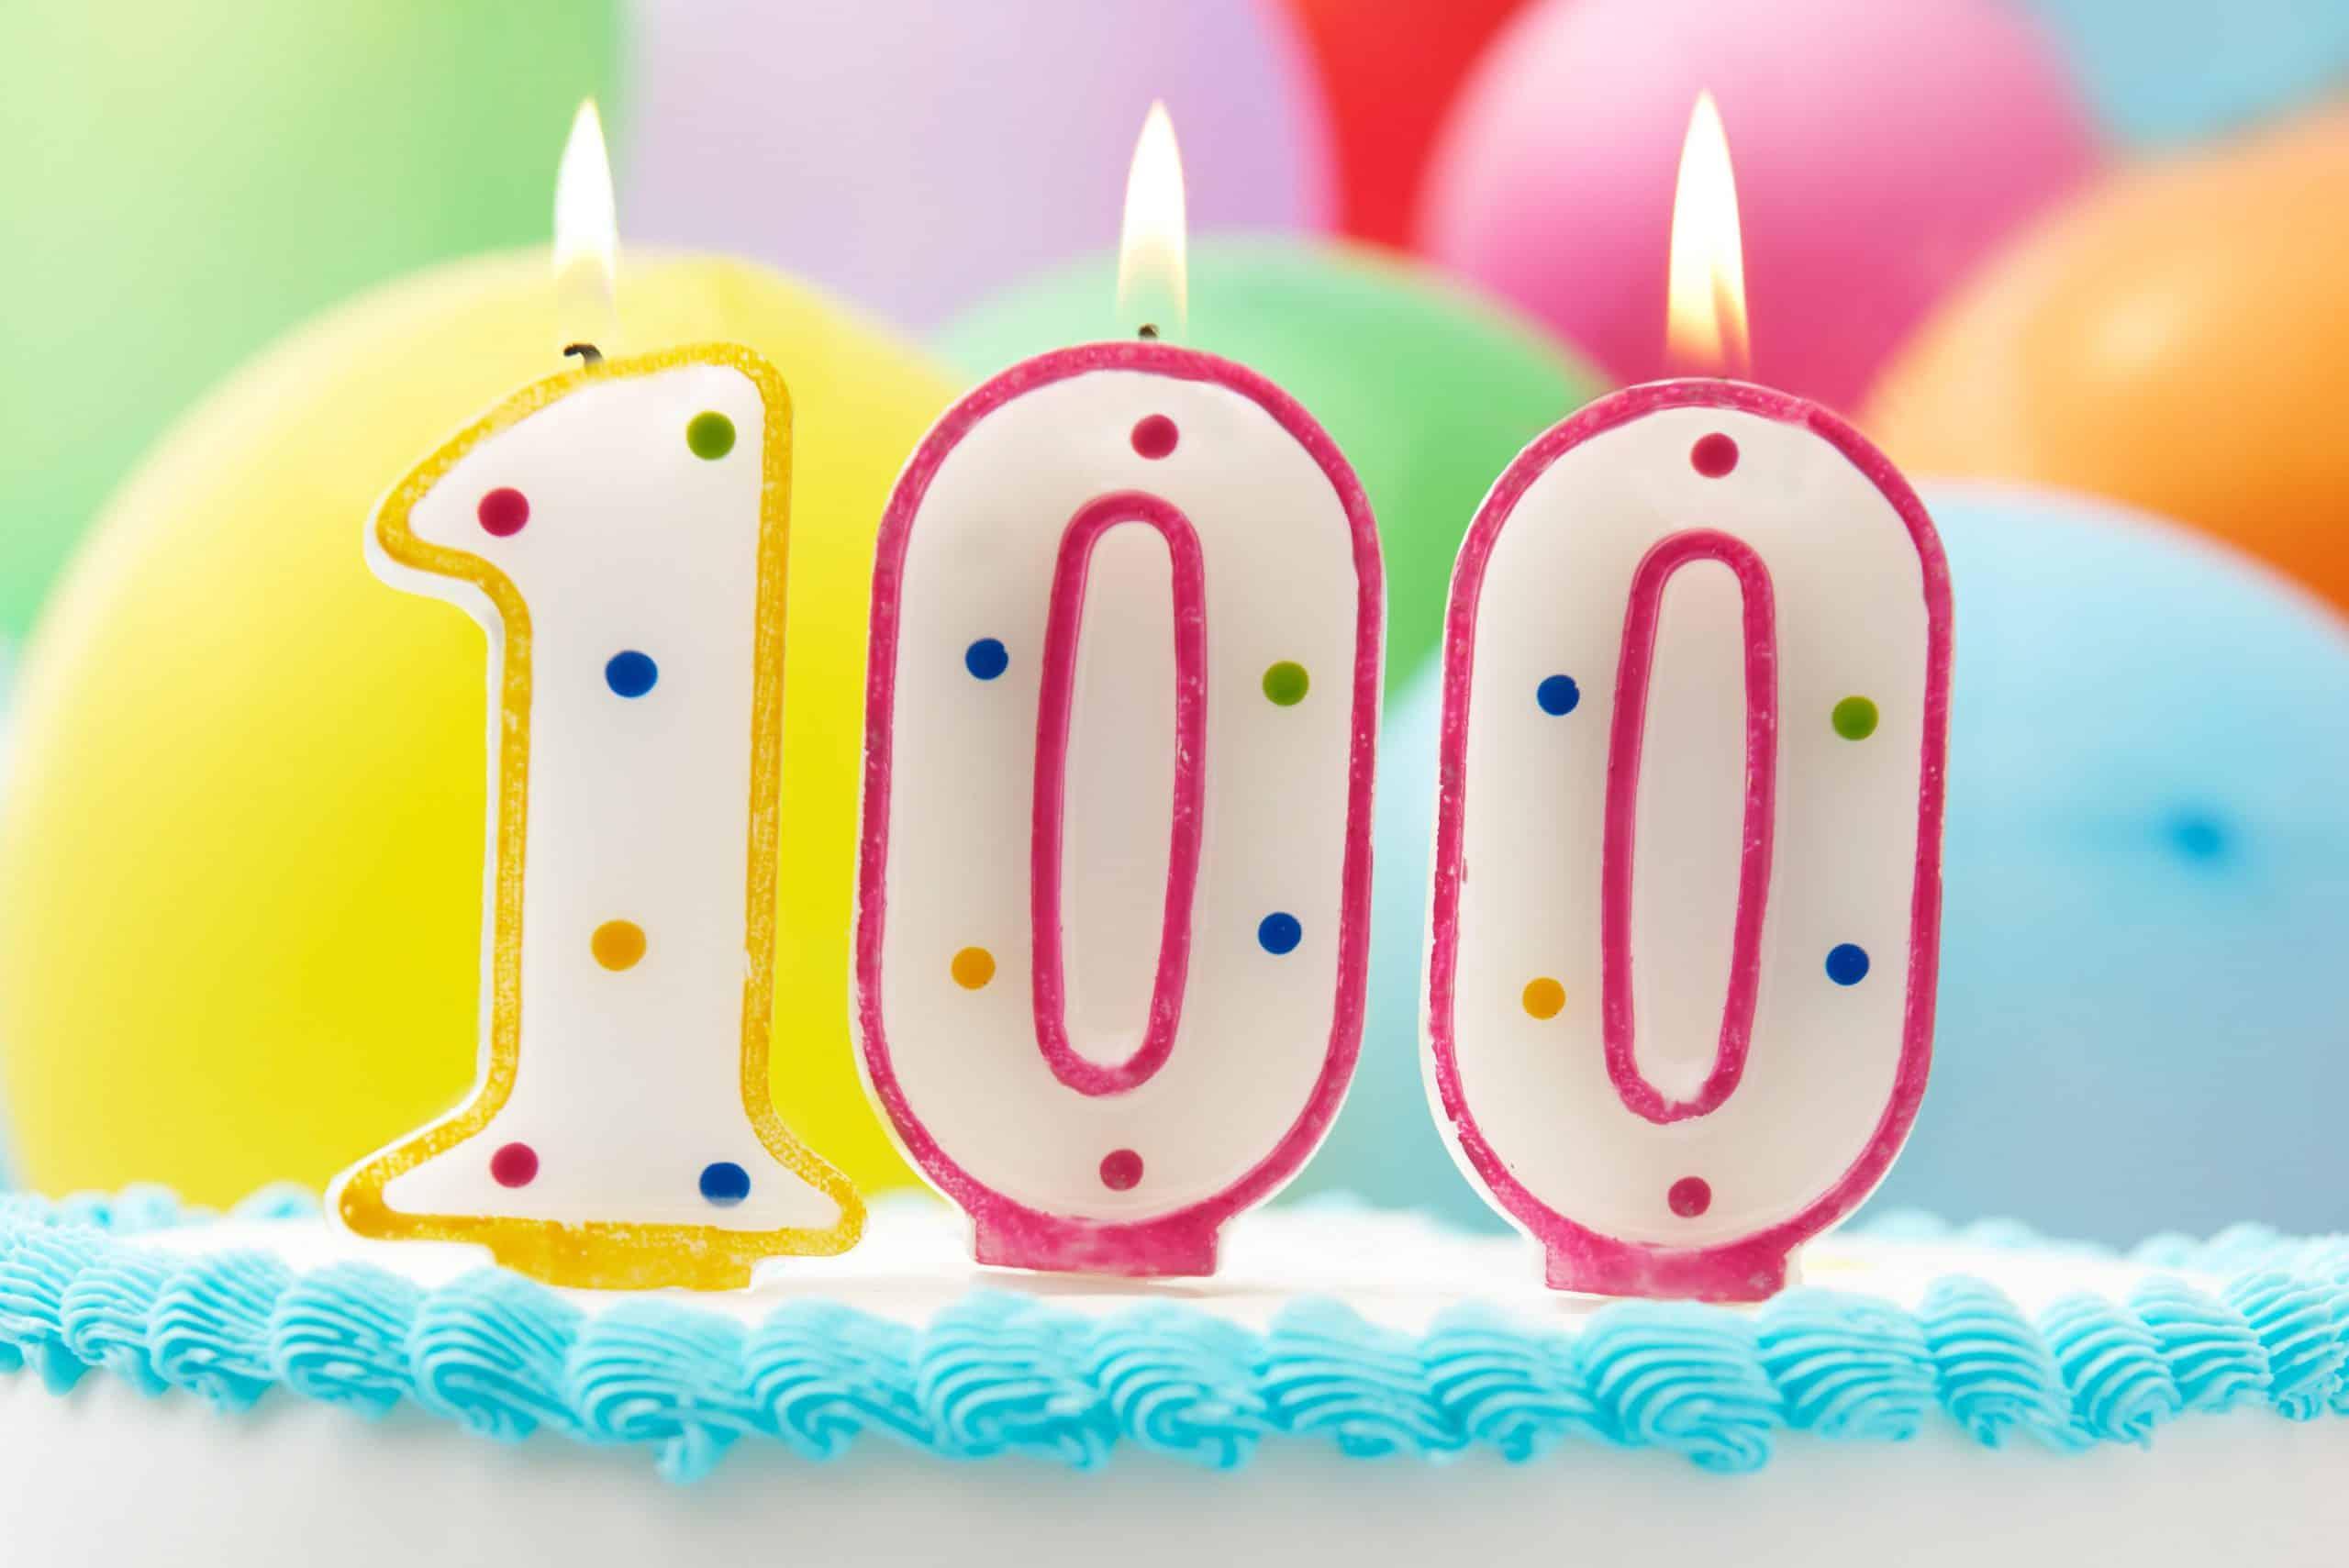 100_birthday-e1576026766531